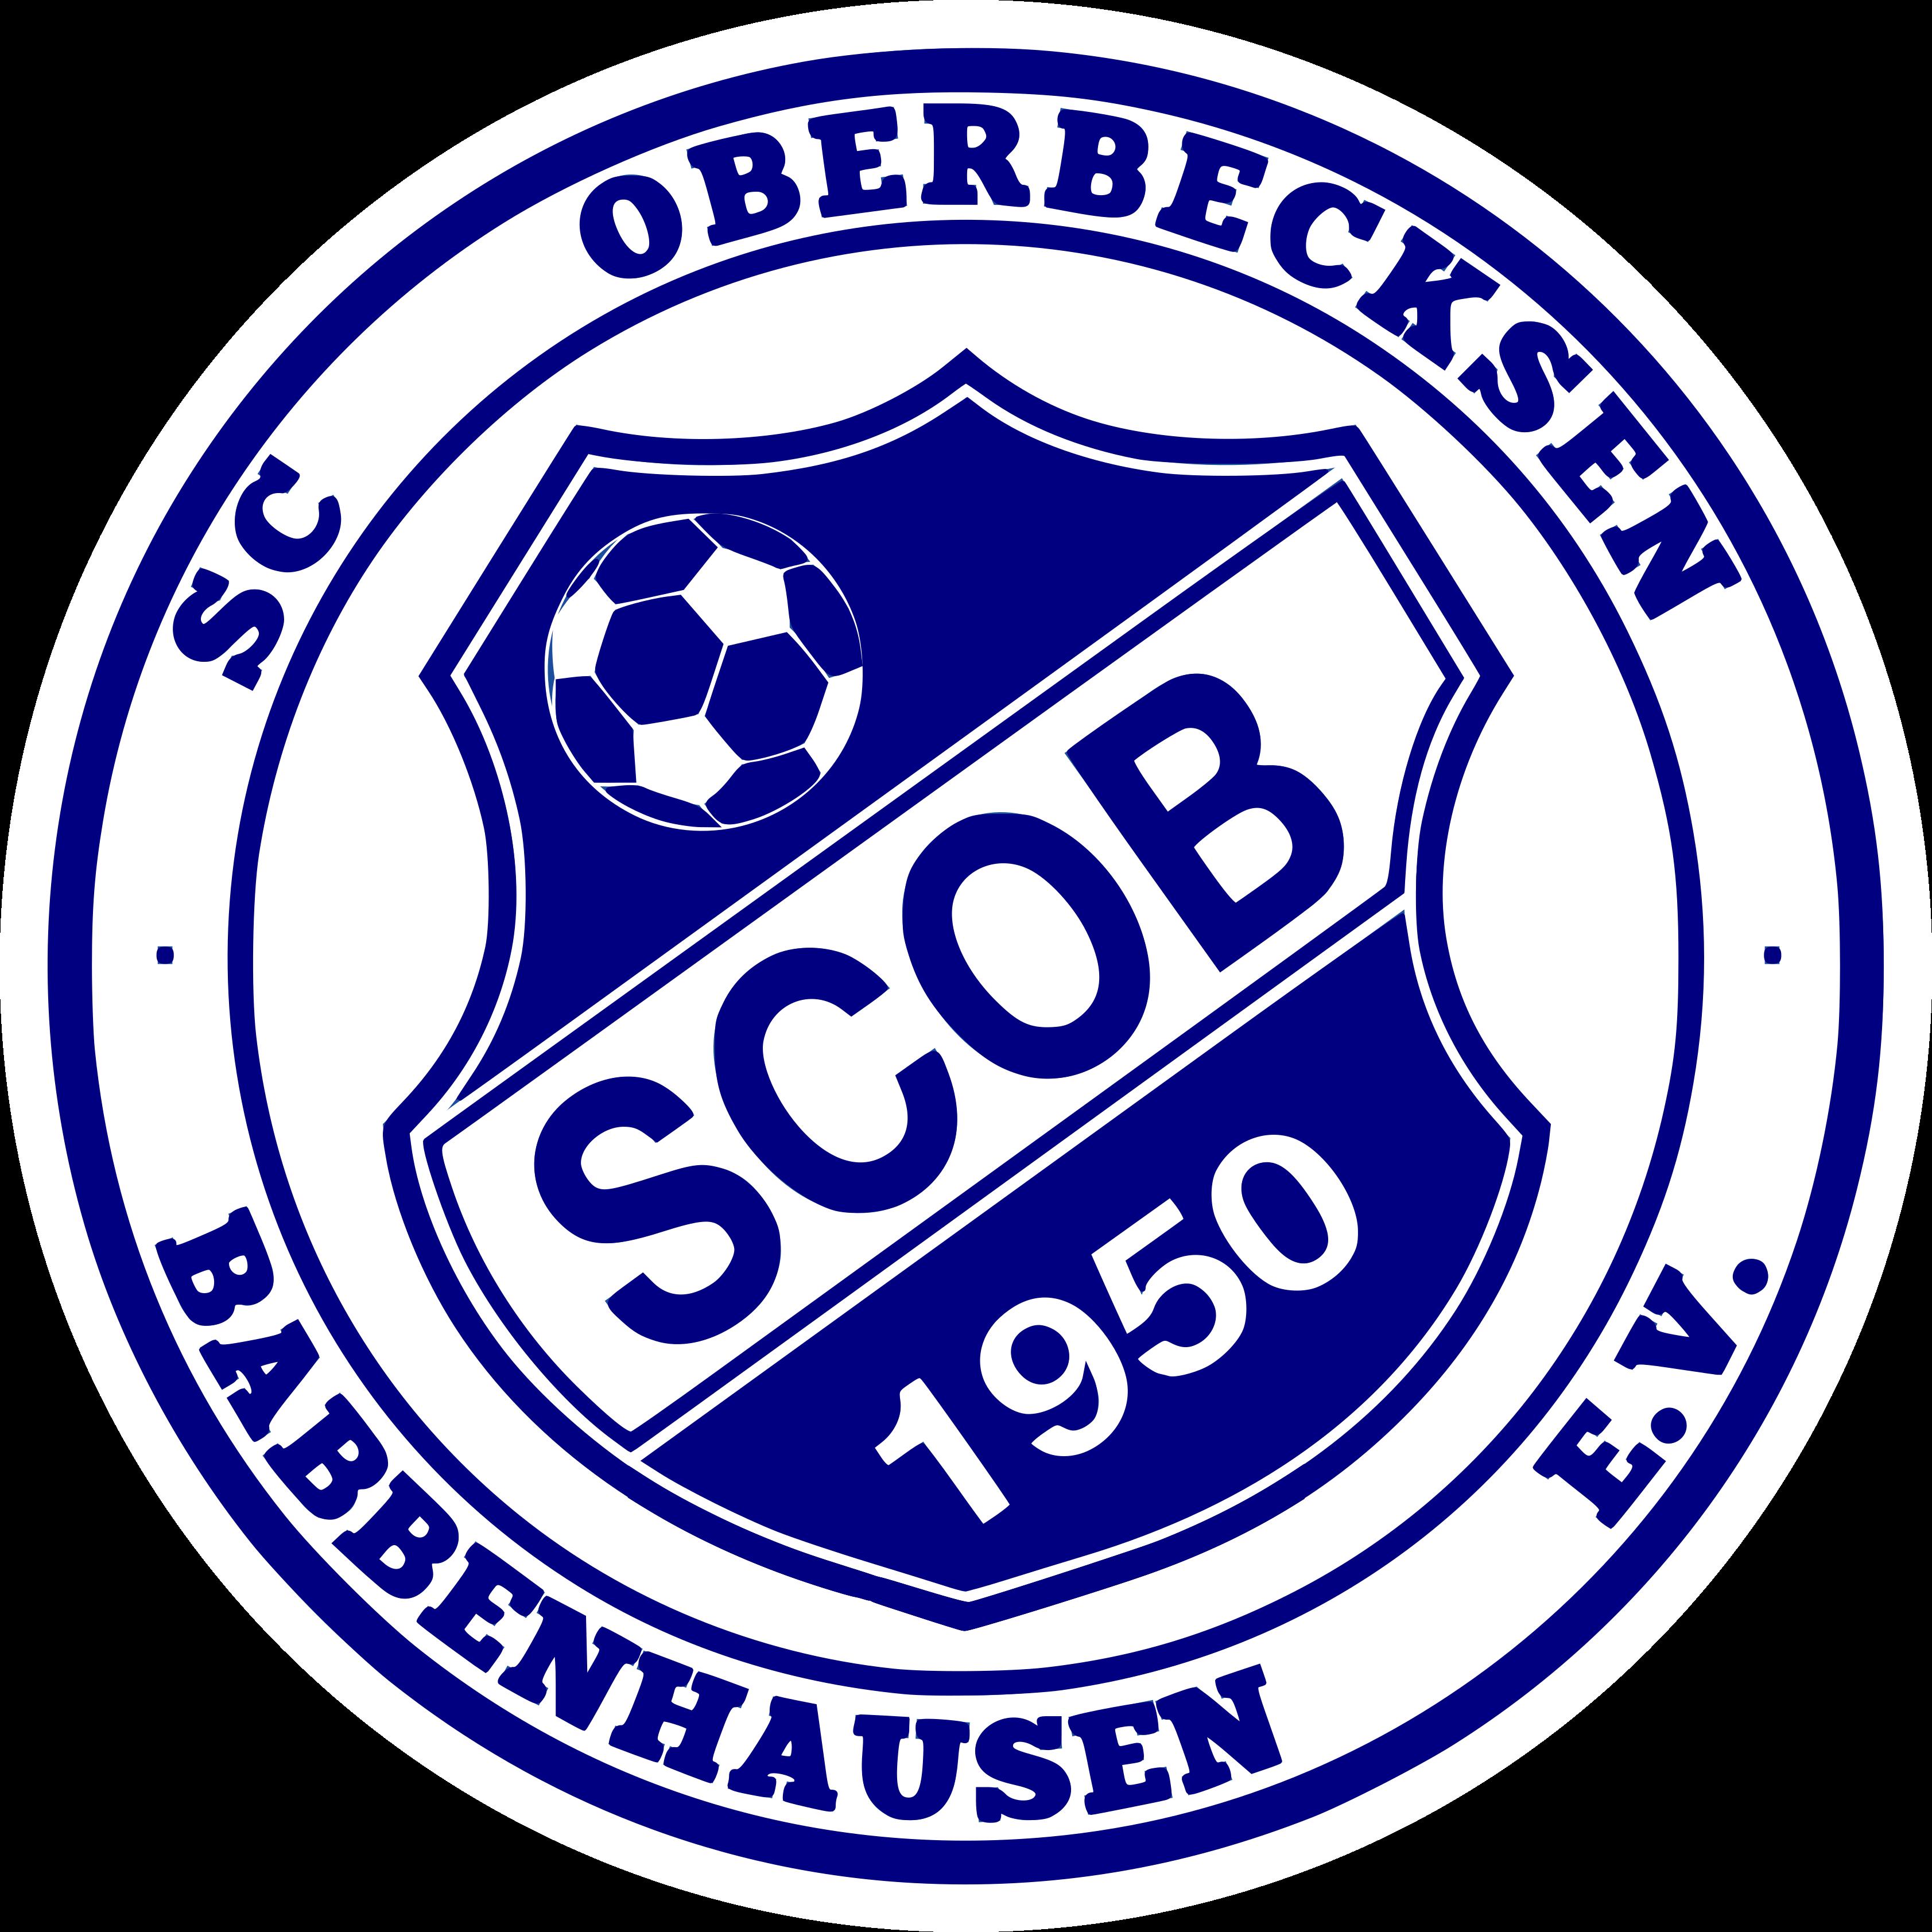 SC Oberbecksen Babbenhausen